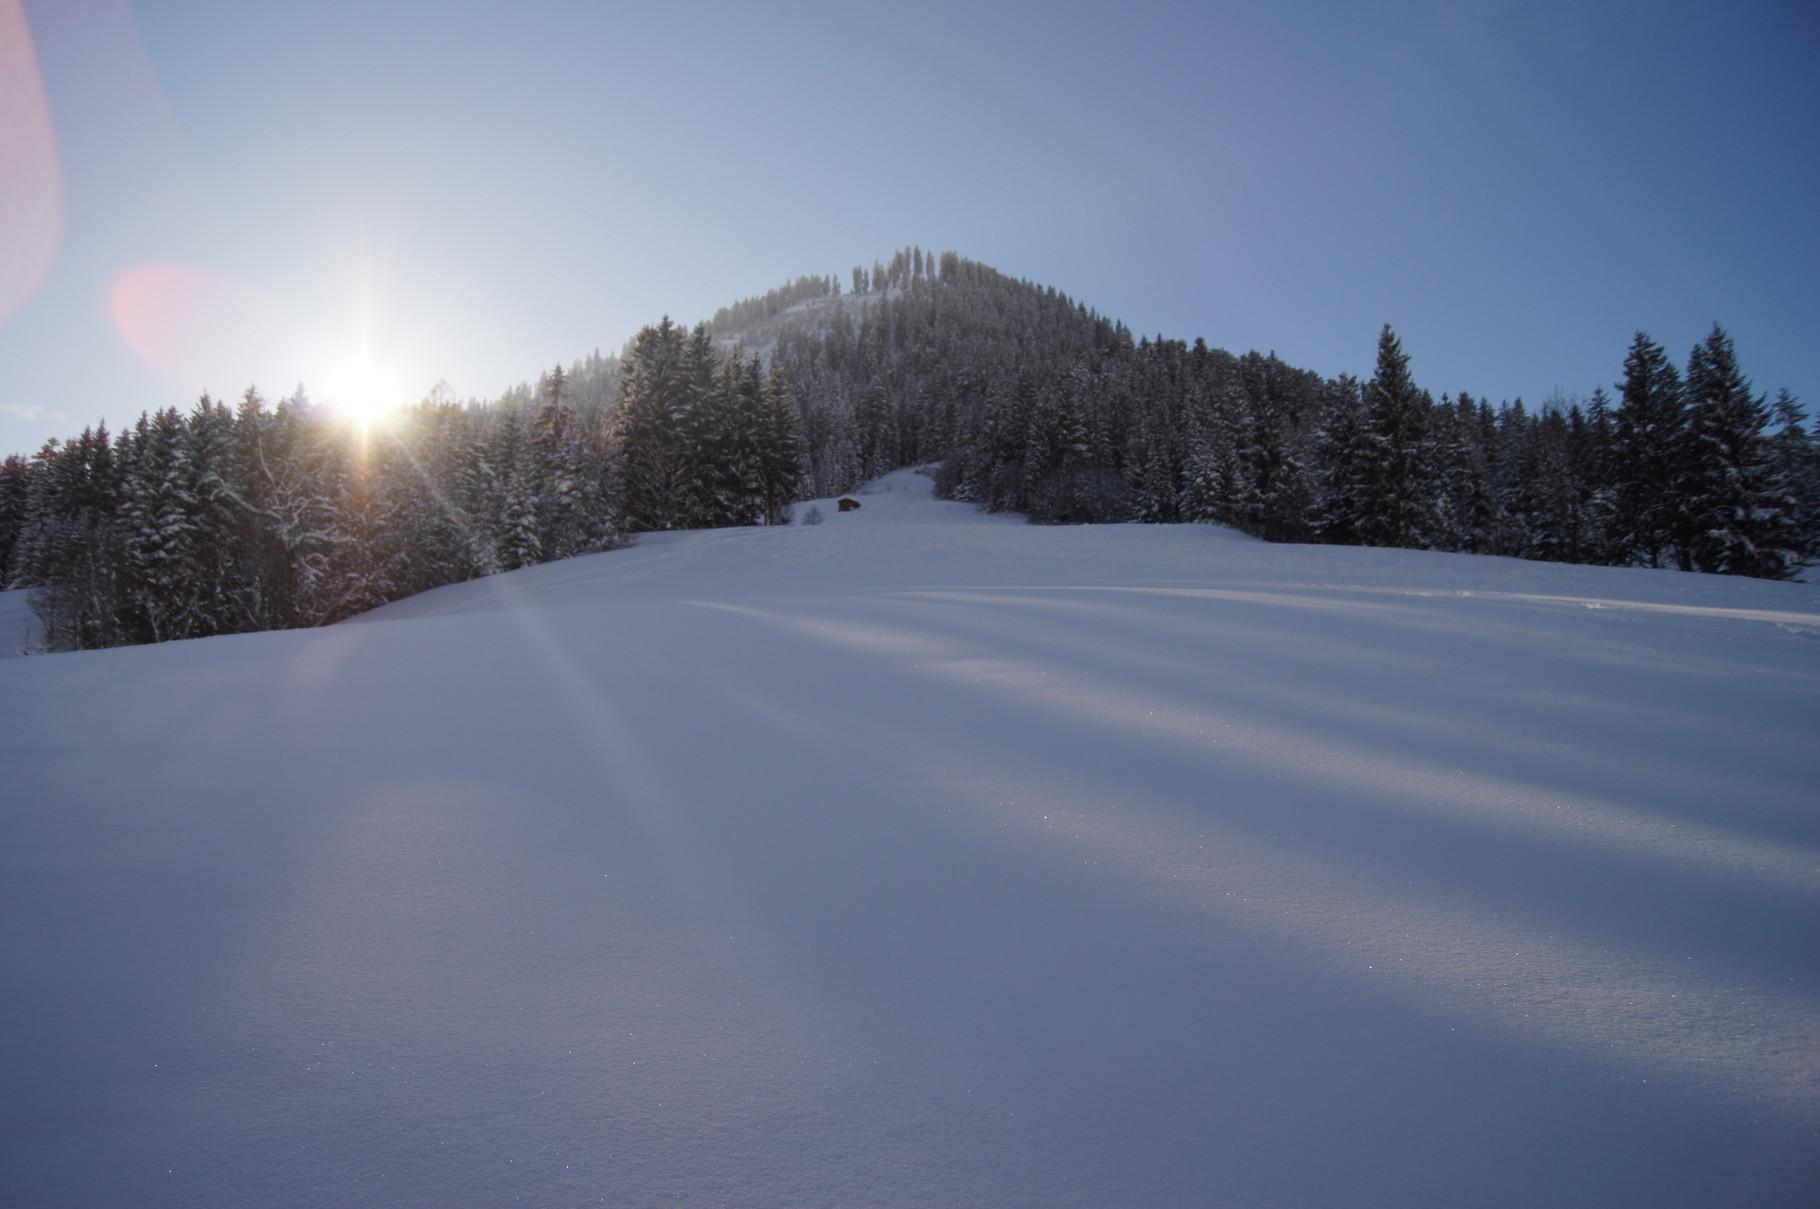 Ski run behind the chalet